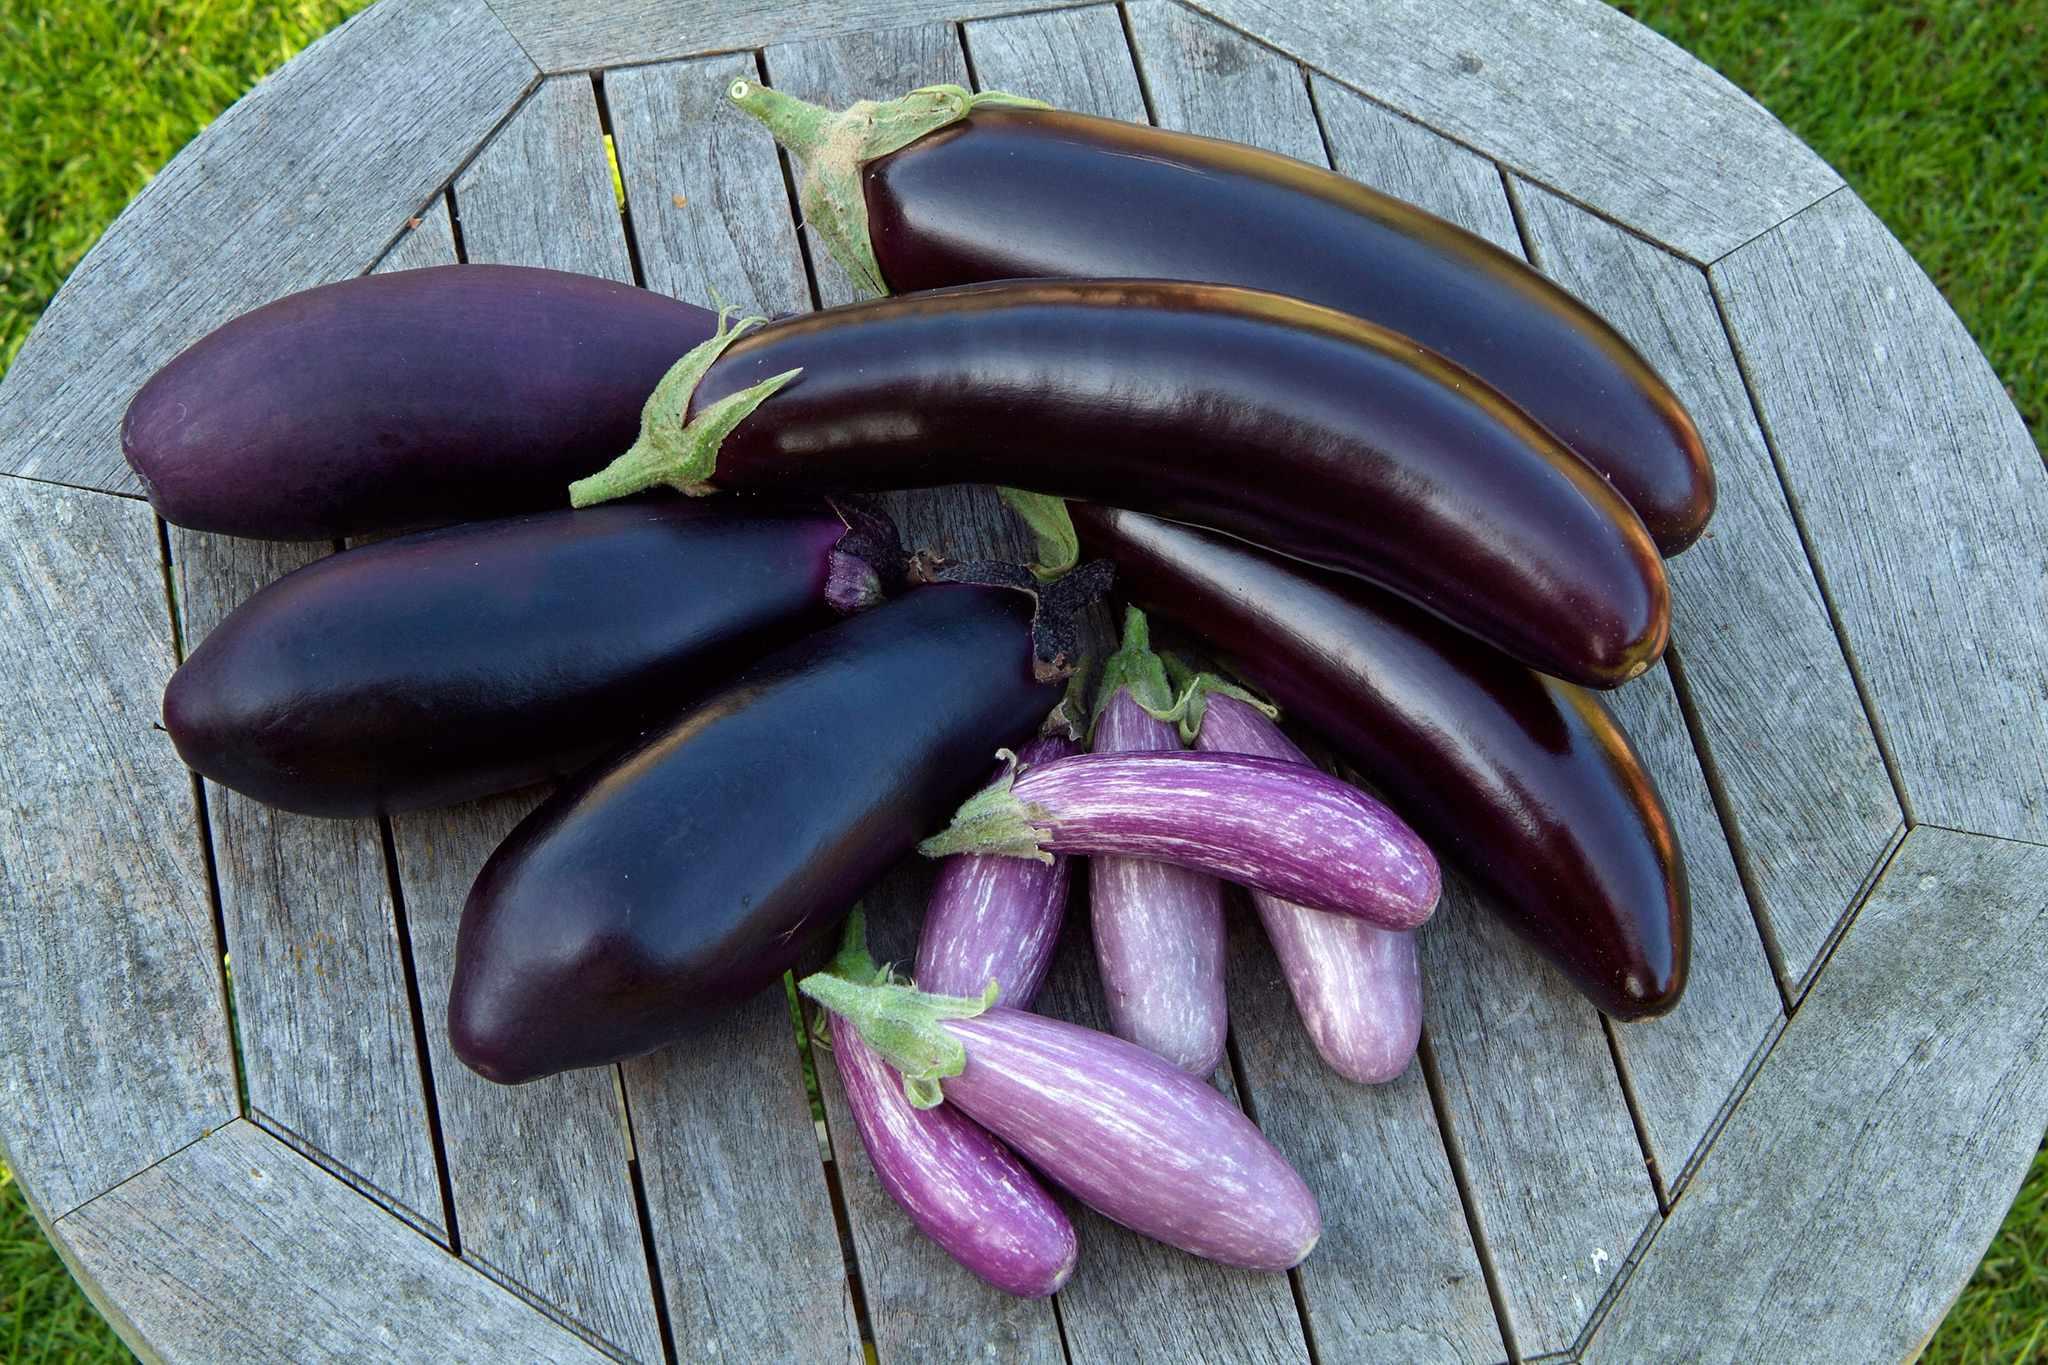 Aubergine varieties